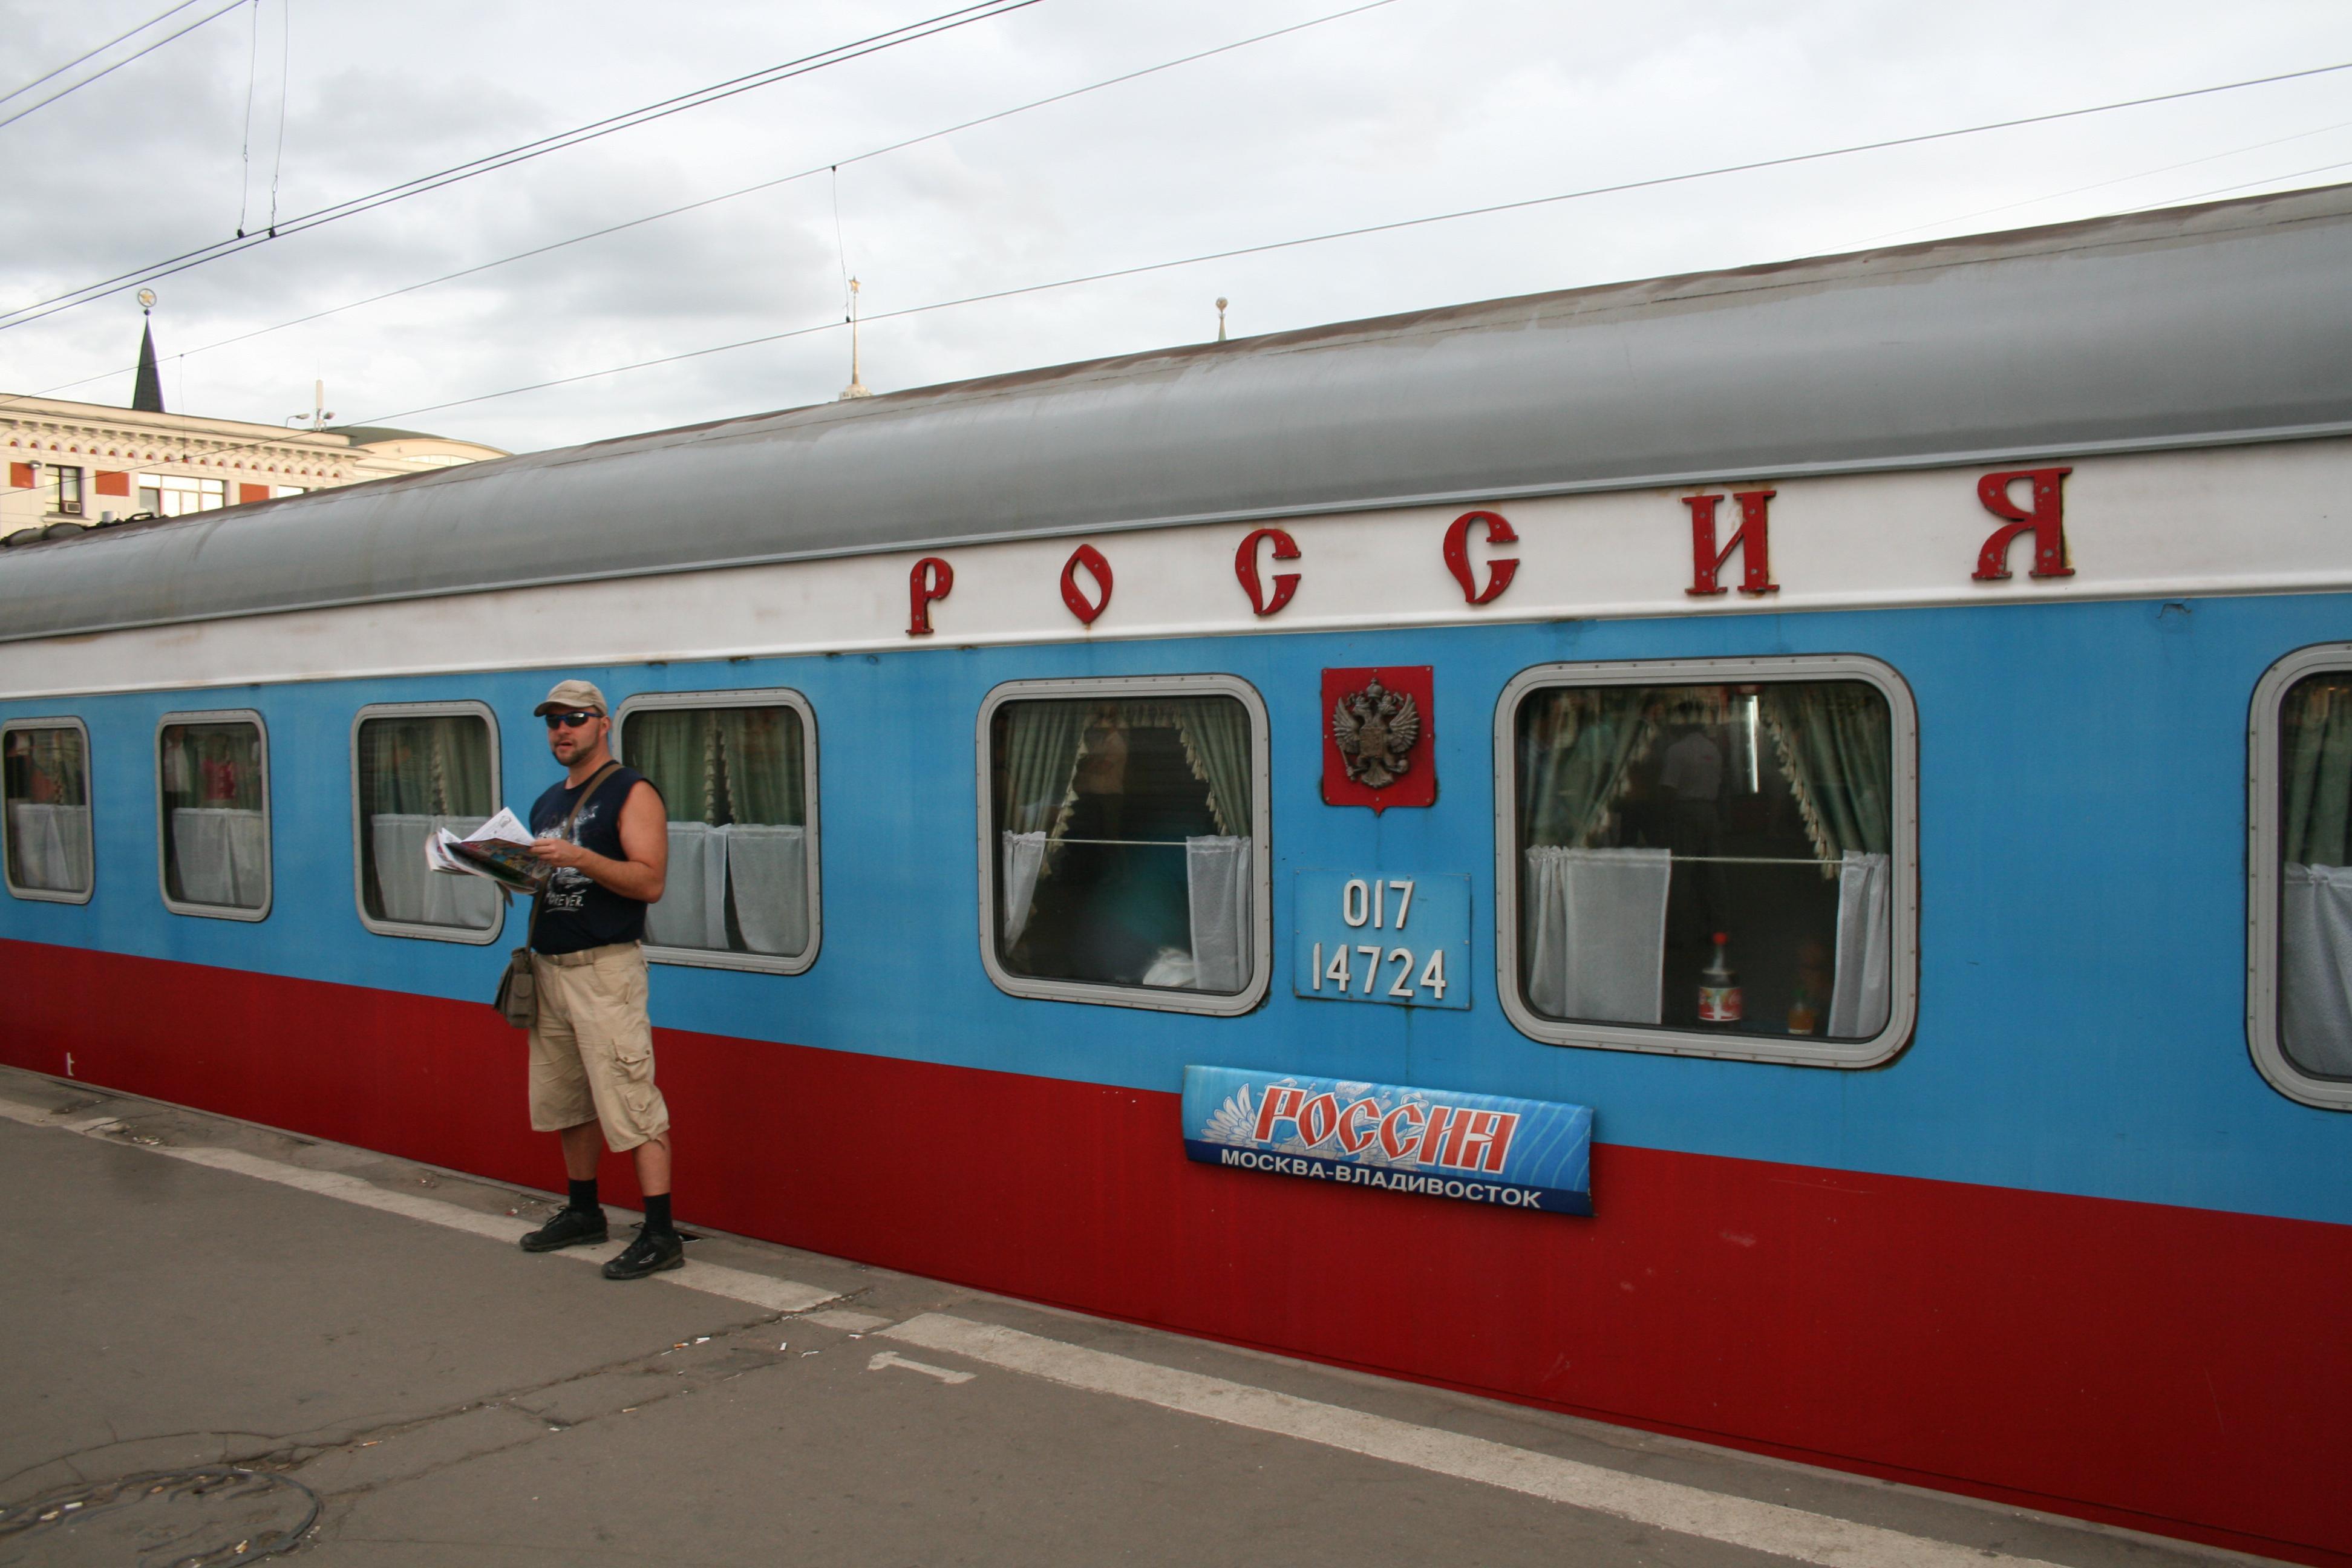 Rossija, 'de' TransSib Moskou-Vladivostok